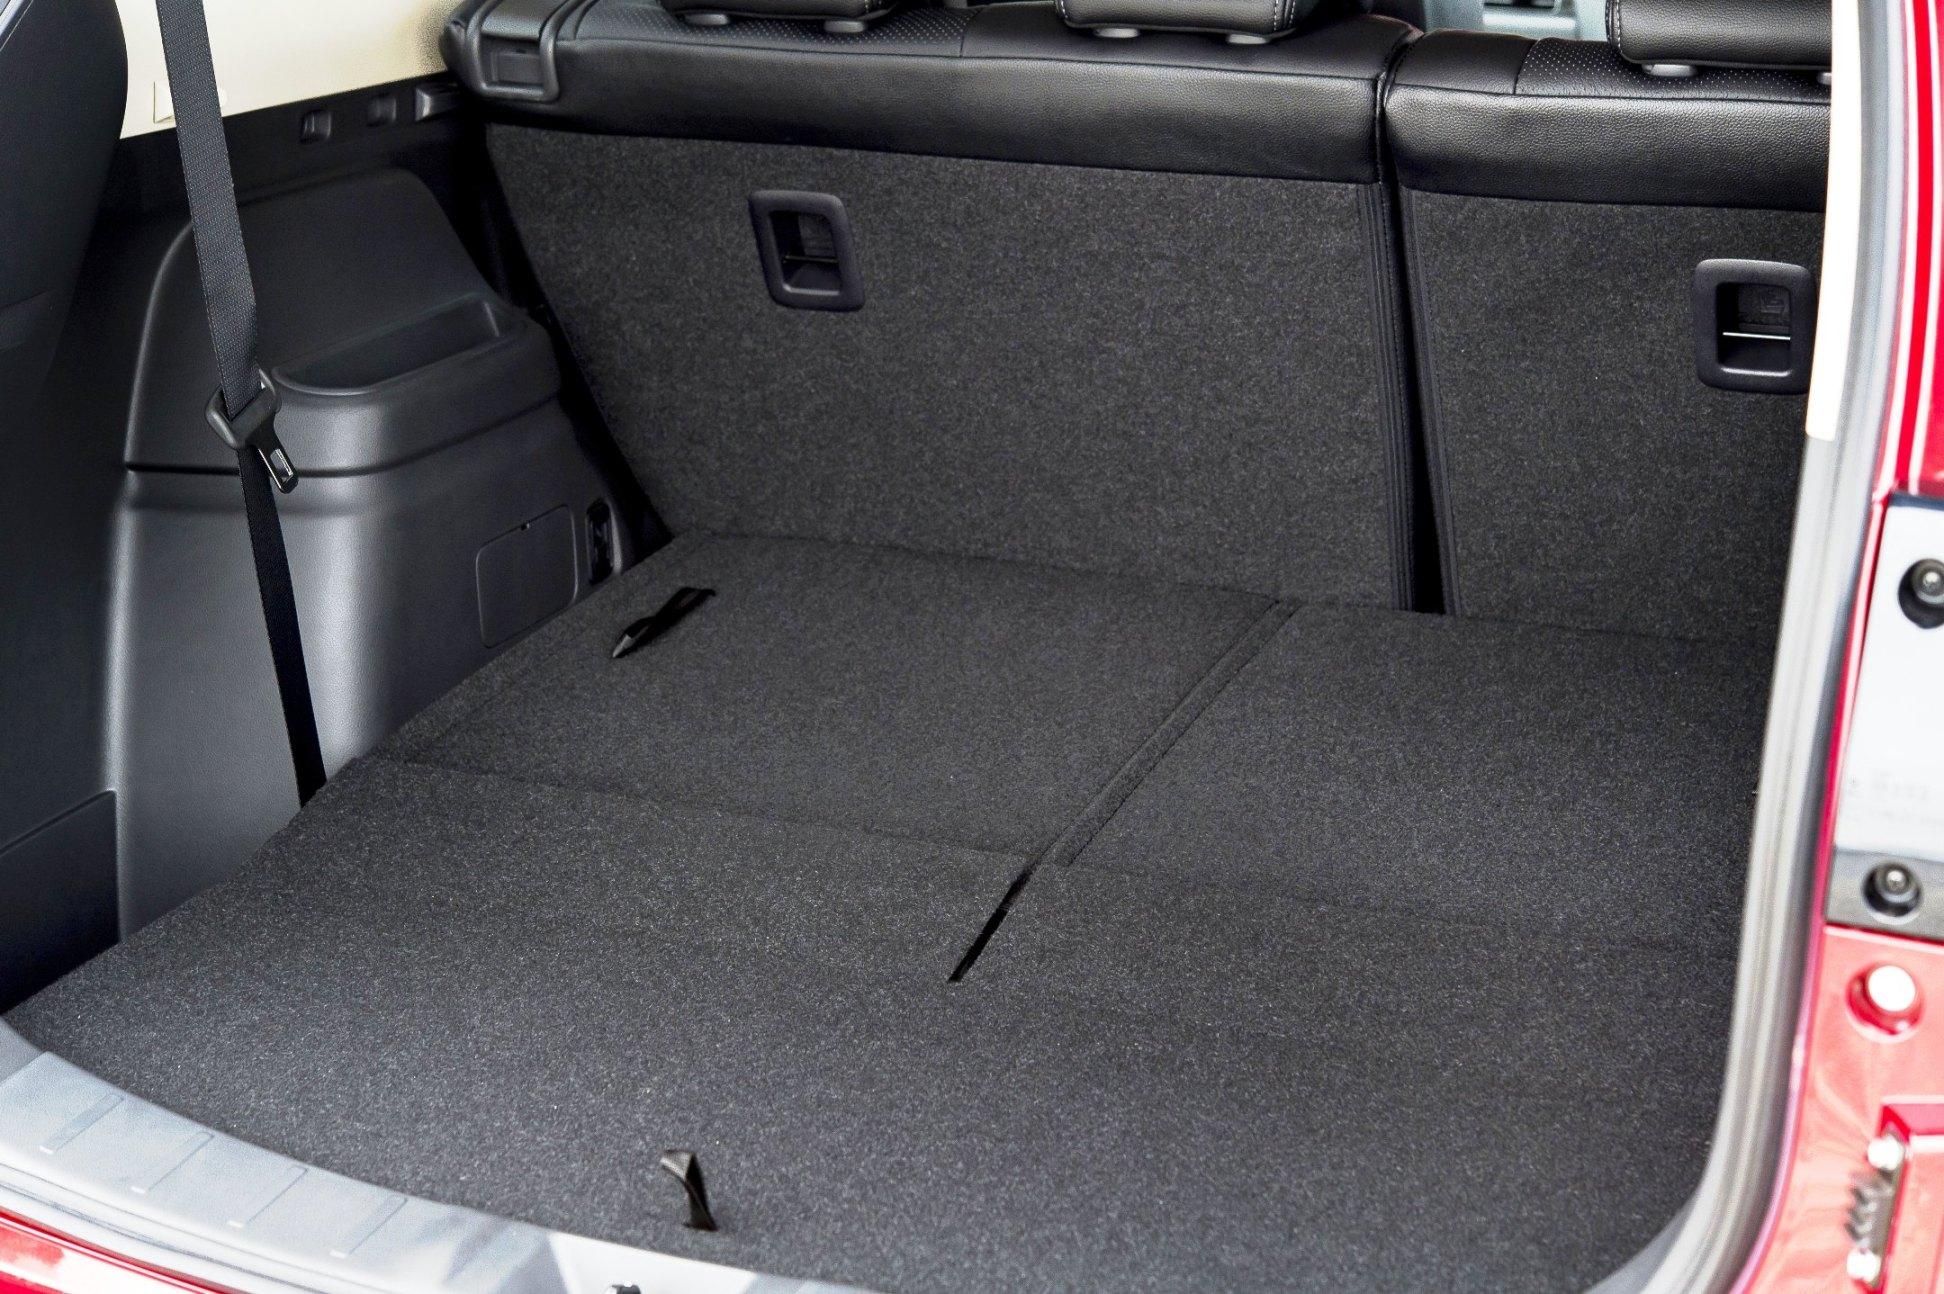 Mitsibishi Outlander diesel 7-seats, rears folded down